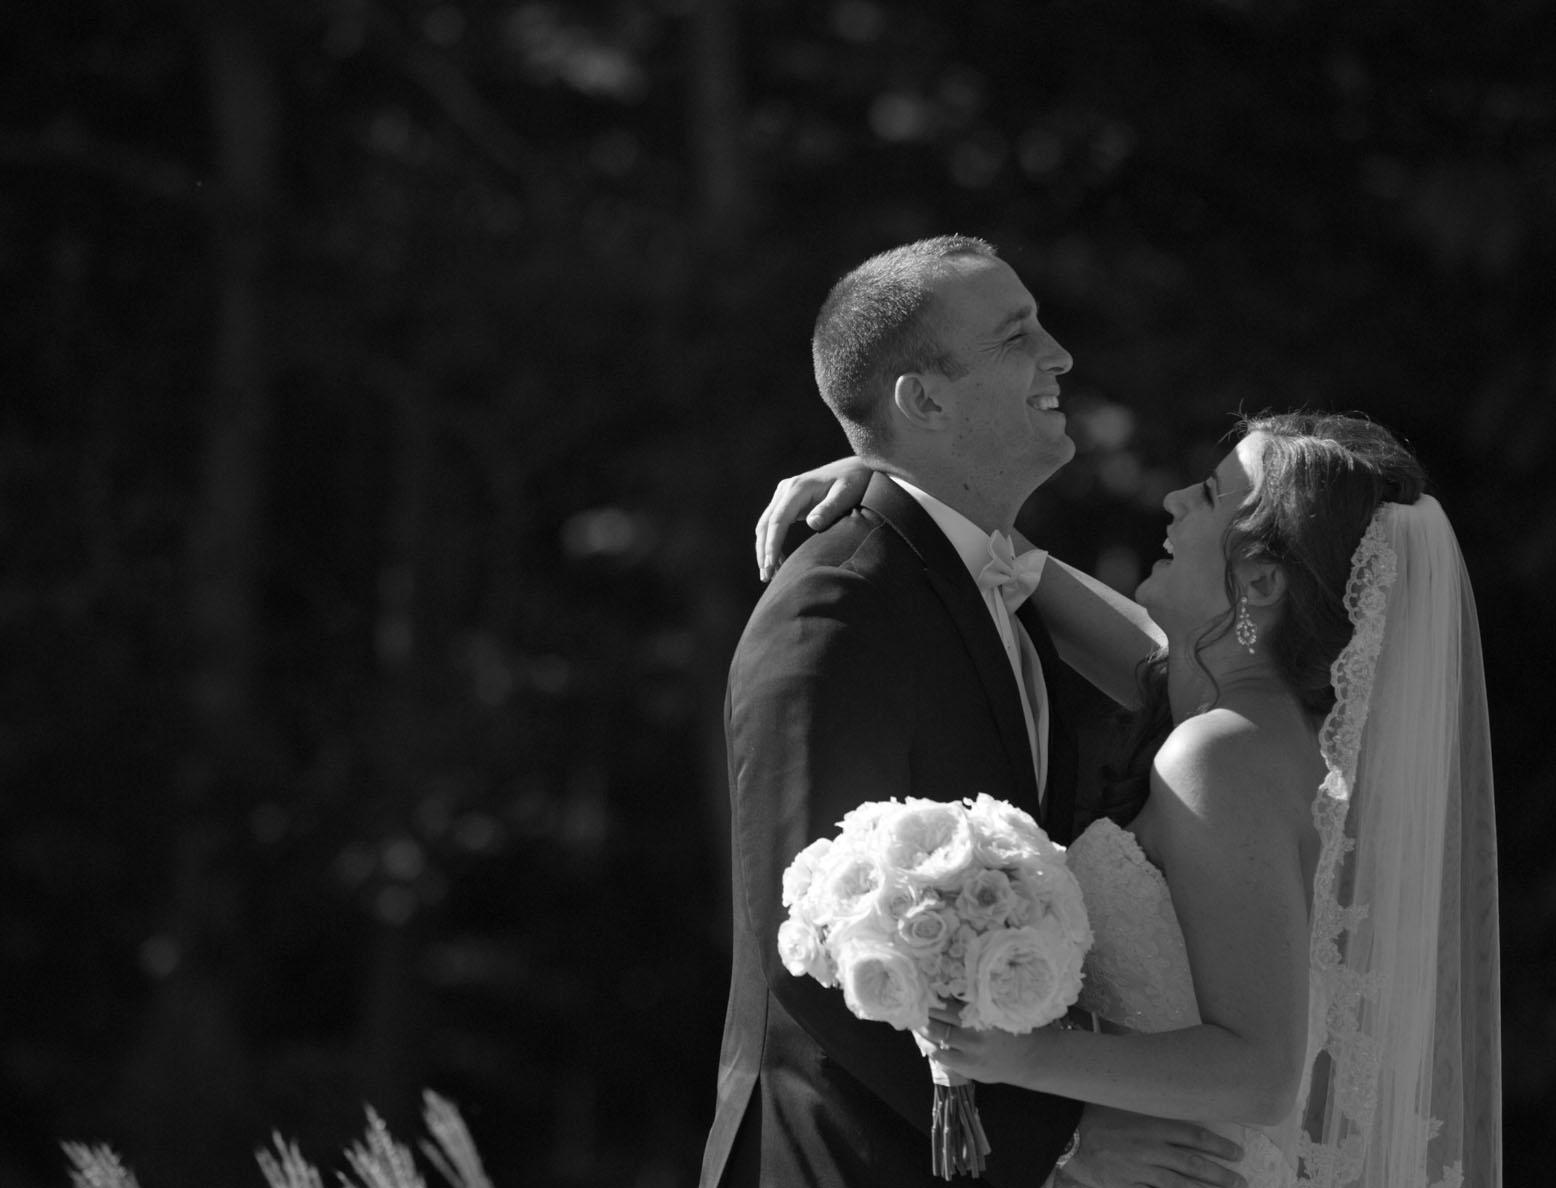 MD DC VA wedding photographer